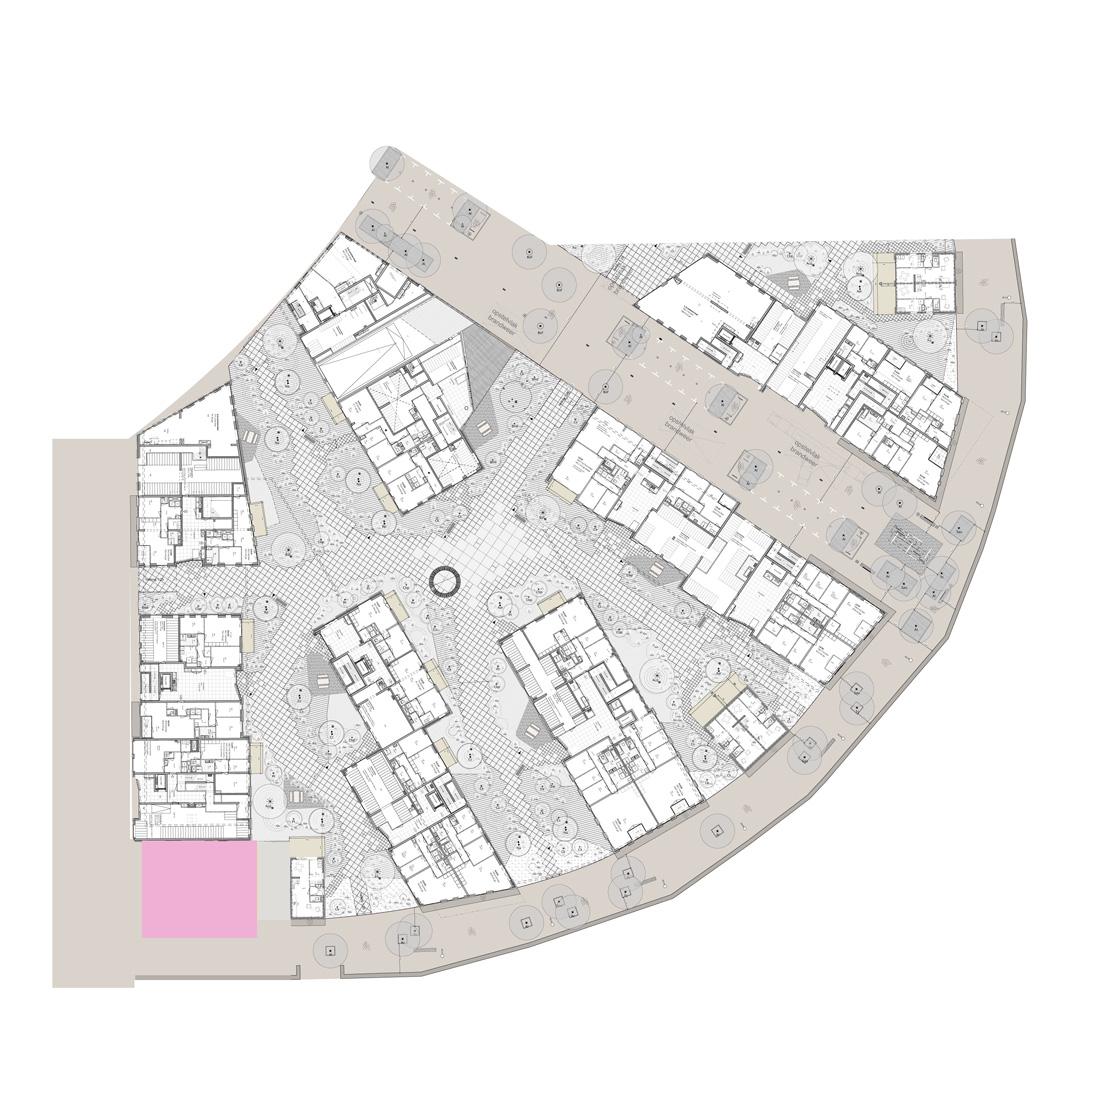 180525_DO_Cruquiuswerf_Plankaart_Maaiveldontwerp